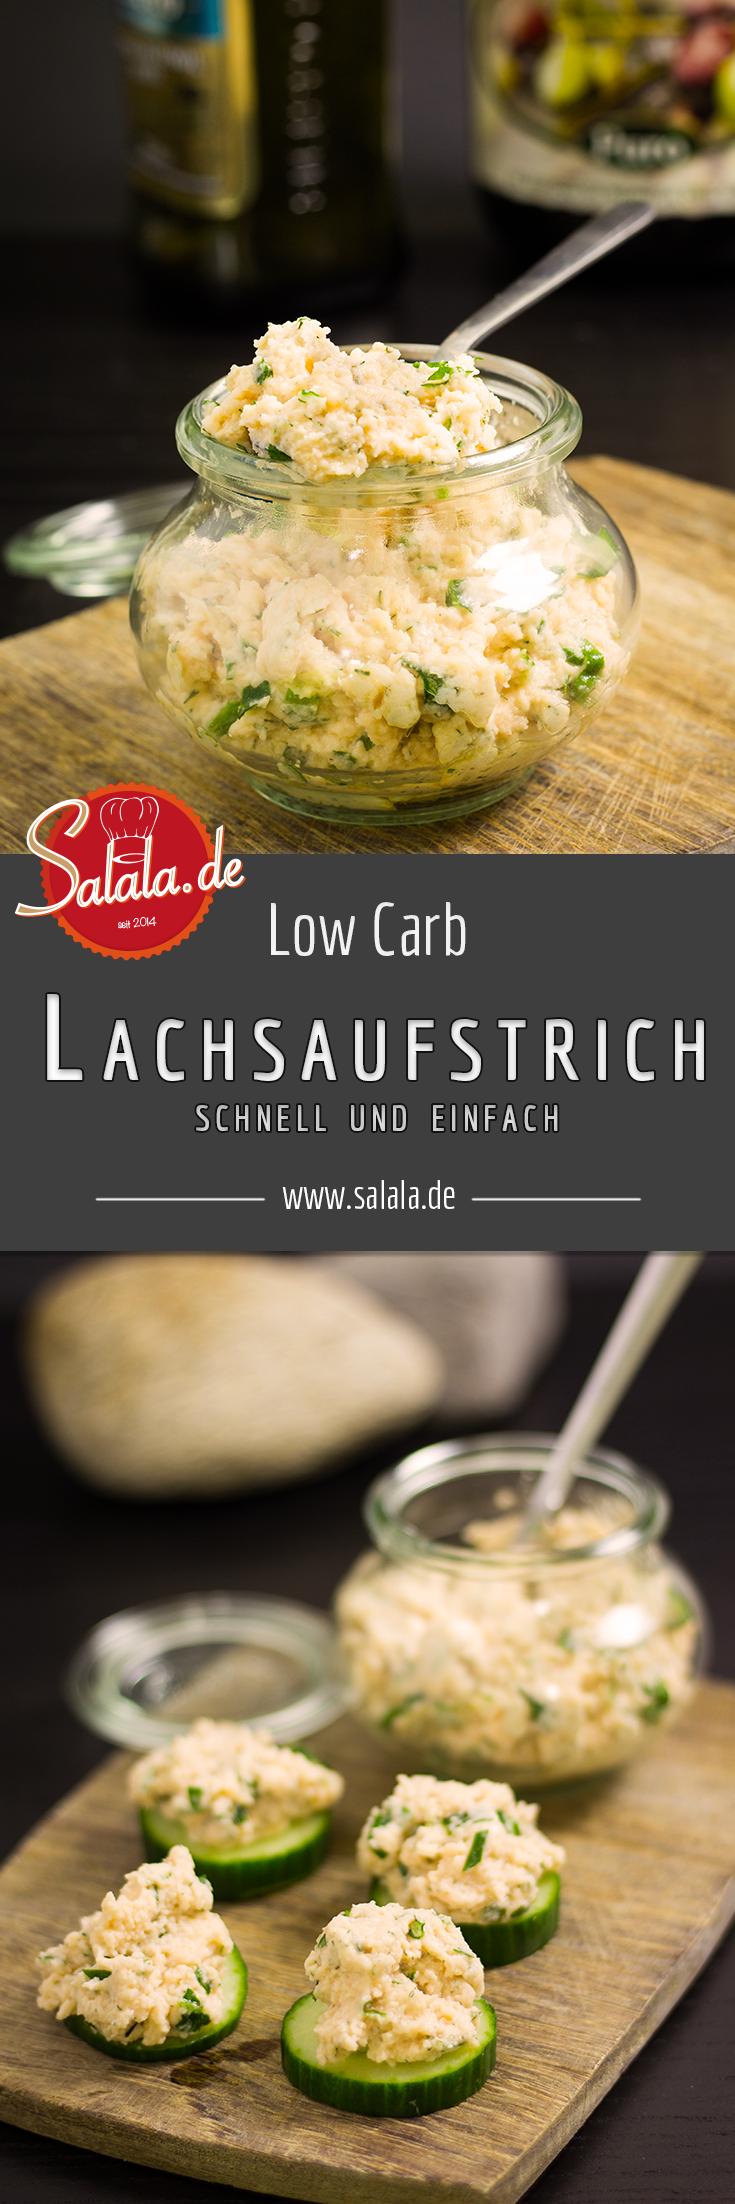 Lachs-Frischkäse-Creme - Low Carb Brotaufstrich selber machen | salala.de – Low Carb leicht gemacht